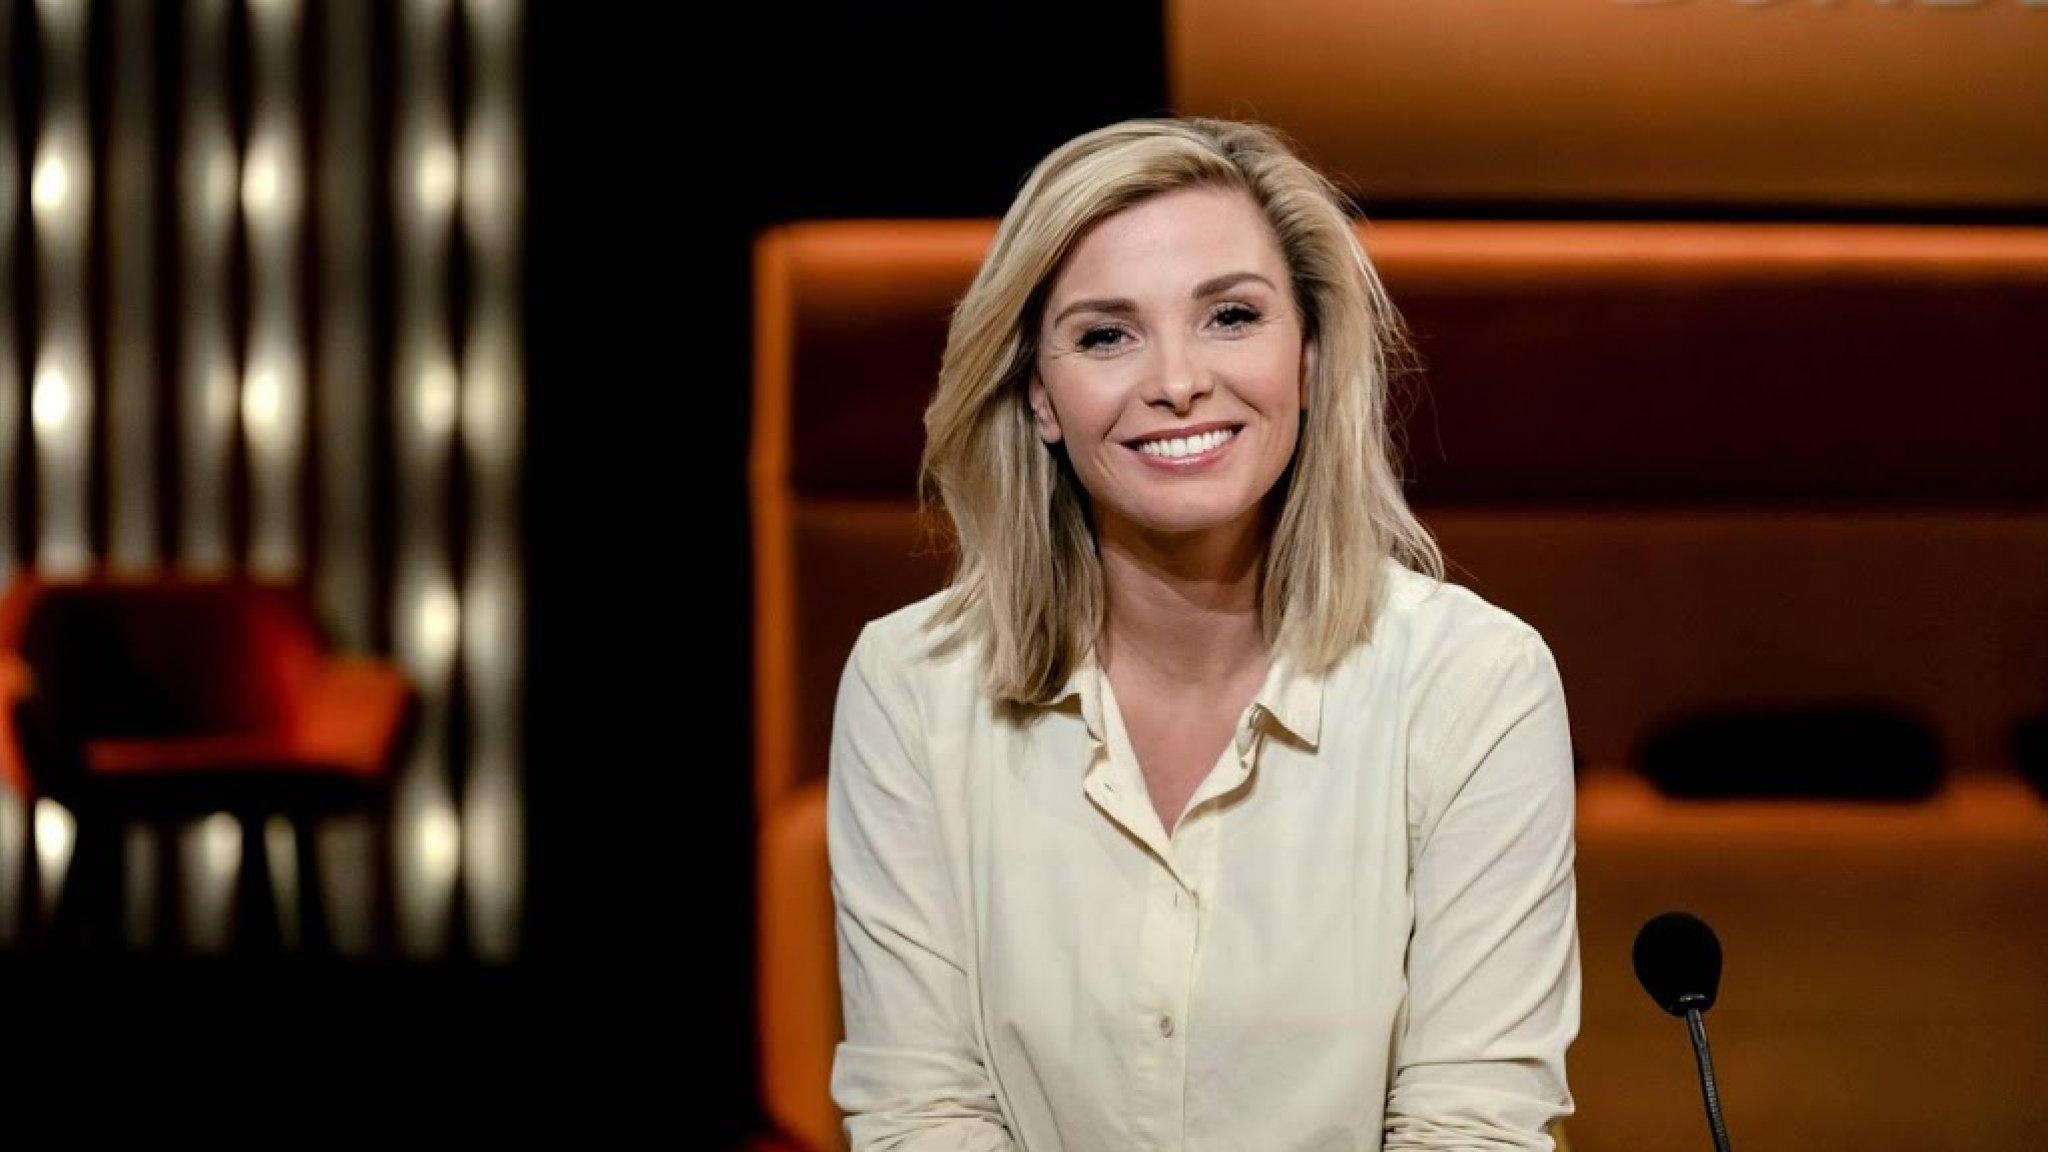 Entertainment Presentatrice Welmoed Sijtsma verbreekt verloving - RTL Nieuws